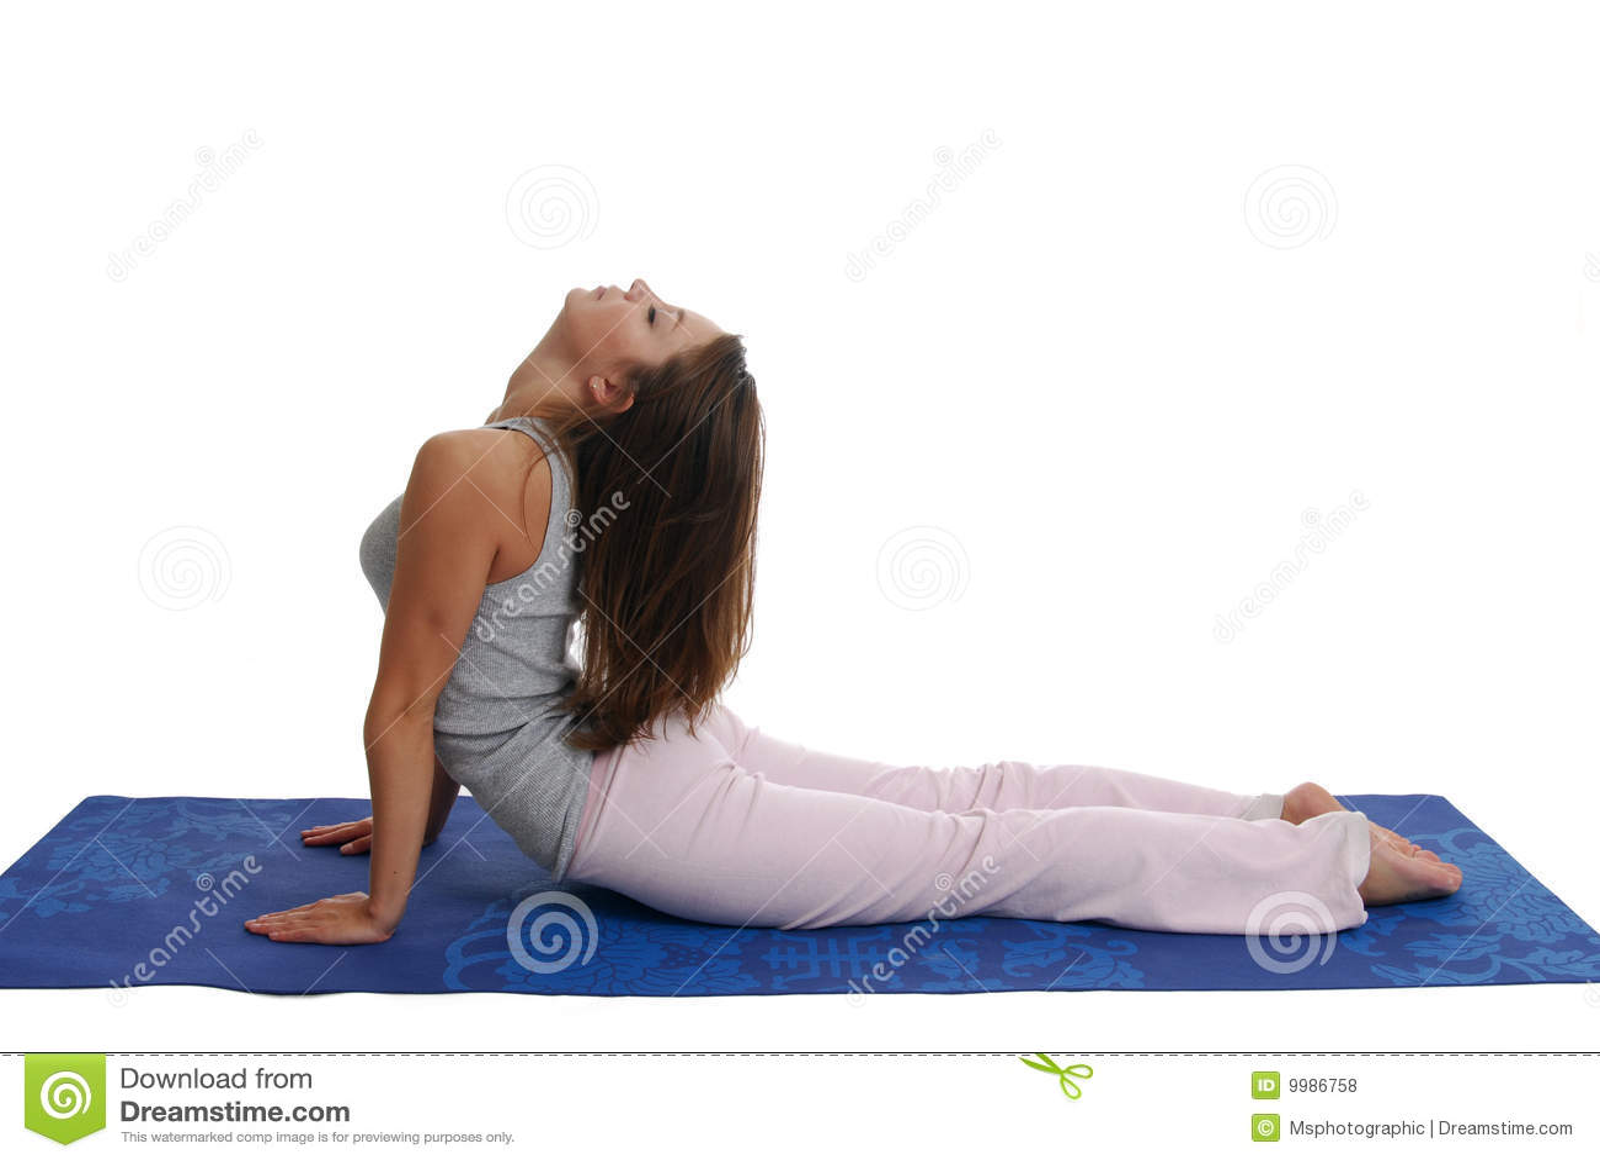 exercices de yoga photos libres de droits image 9986758. Black Bedroom Furniture Sets. Home Design Ideas